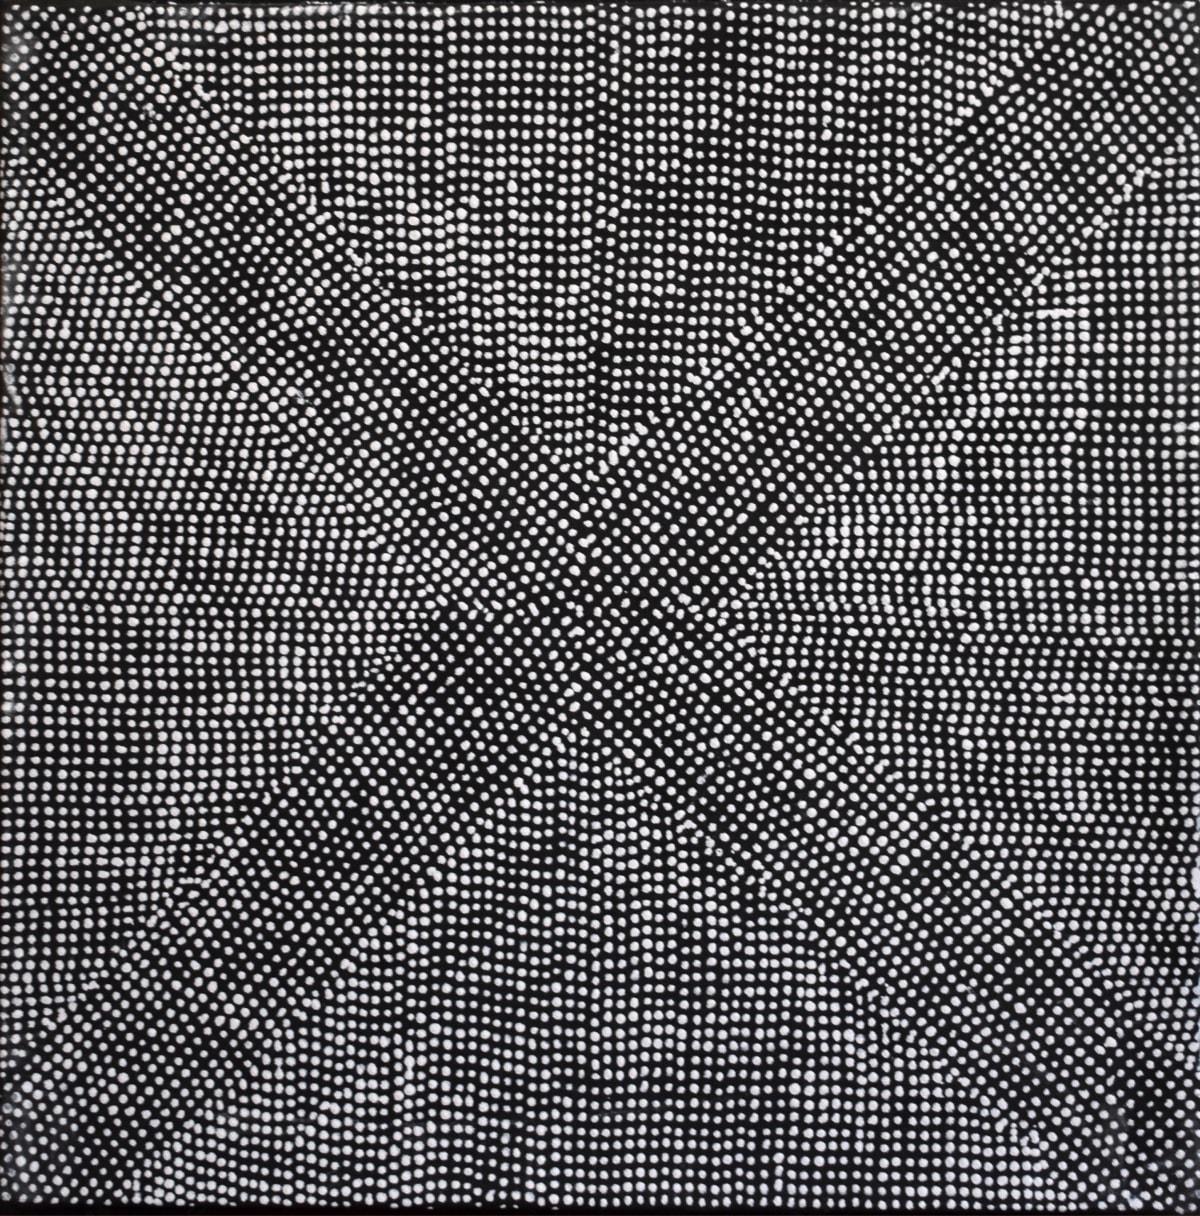 Barbara Puruntatameri Murrakupupuni natural ochres on canvas 45 x 45 cm